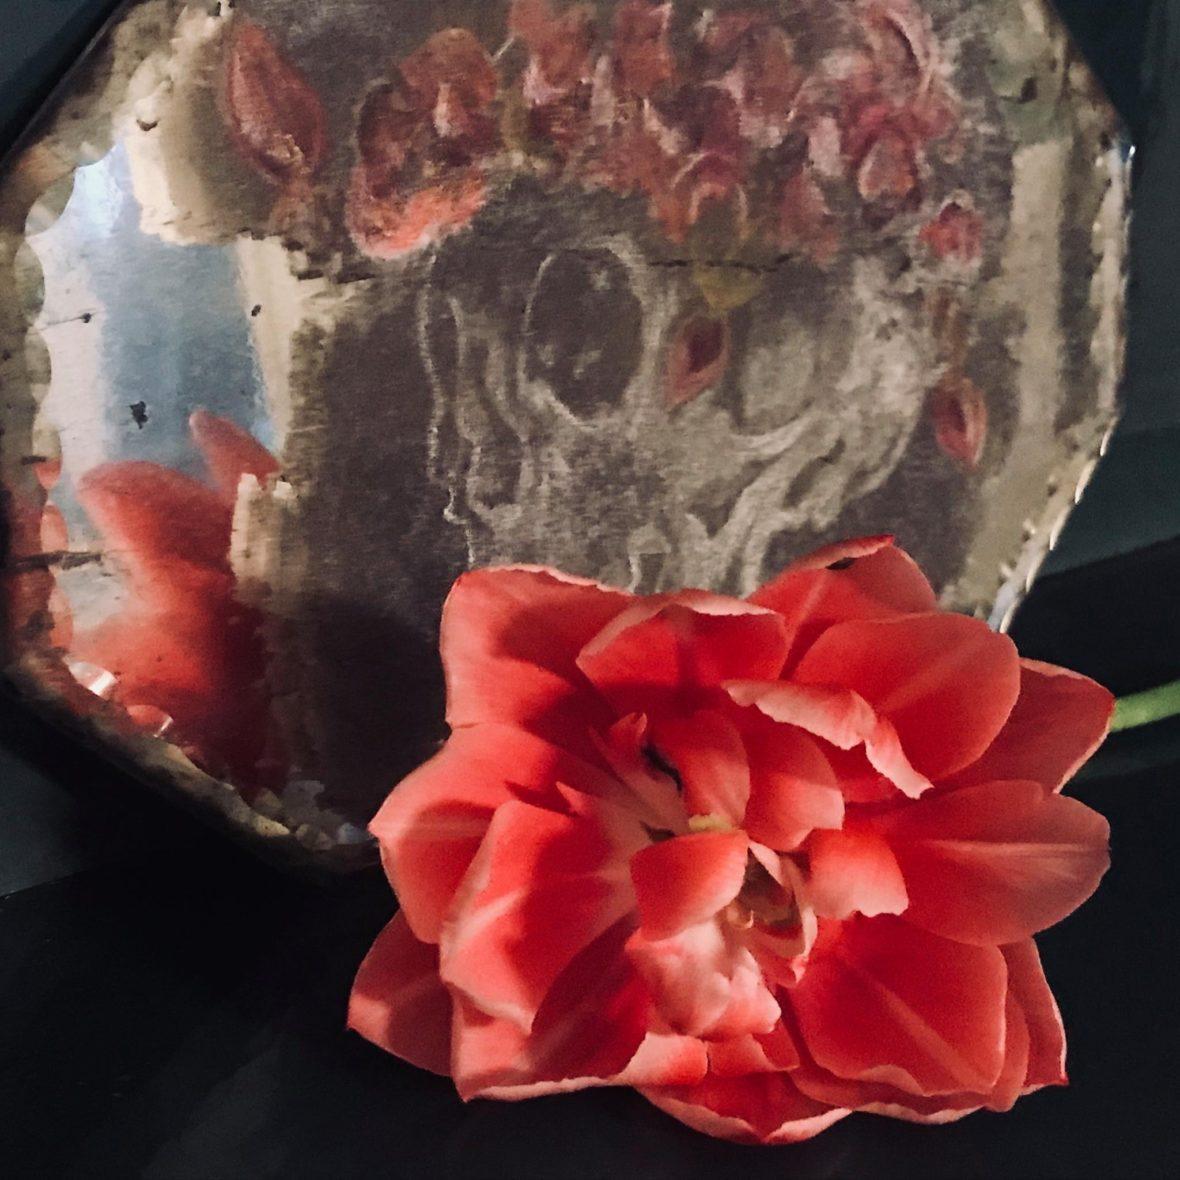 Mirror mirror in muro…, 2018, mokulitografia ja pigmentinsiirto peilille, 28 x 13,5 cm